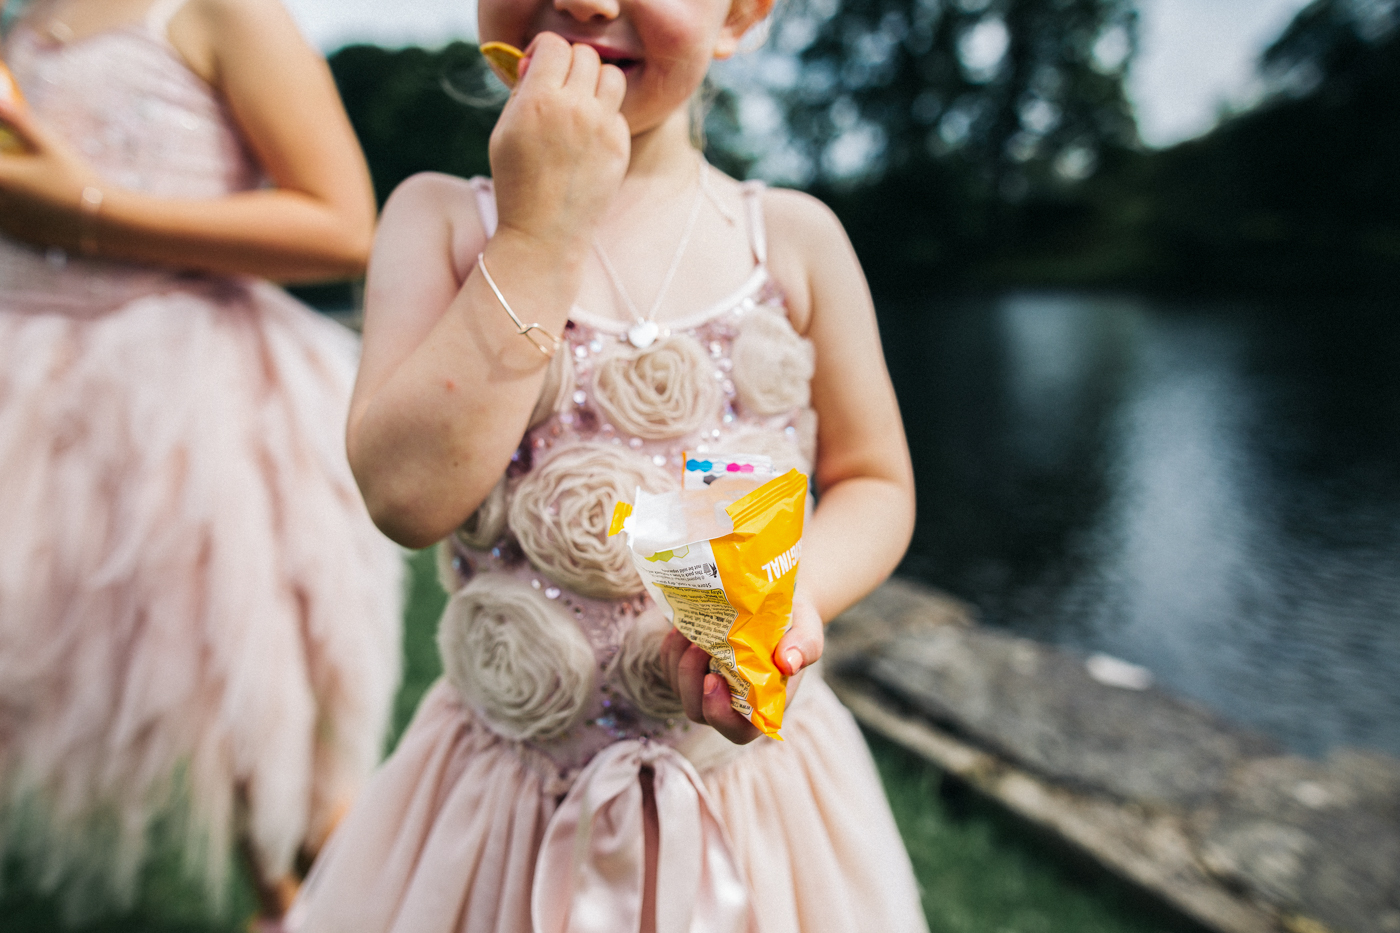 teesside-middlesbrough-north-east-wedding-photographer-creative-wedding-venues-0065.jpg